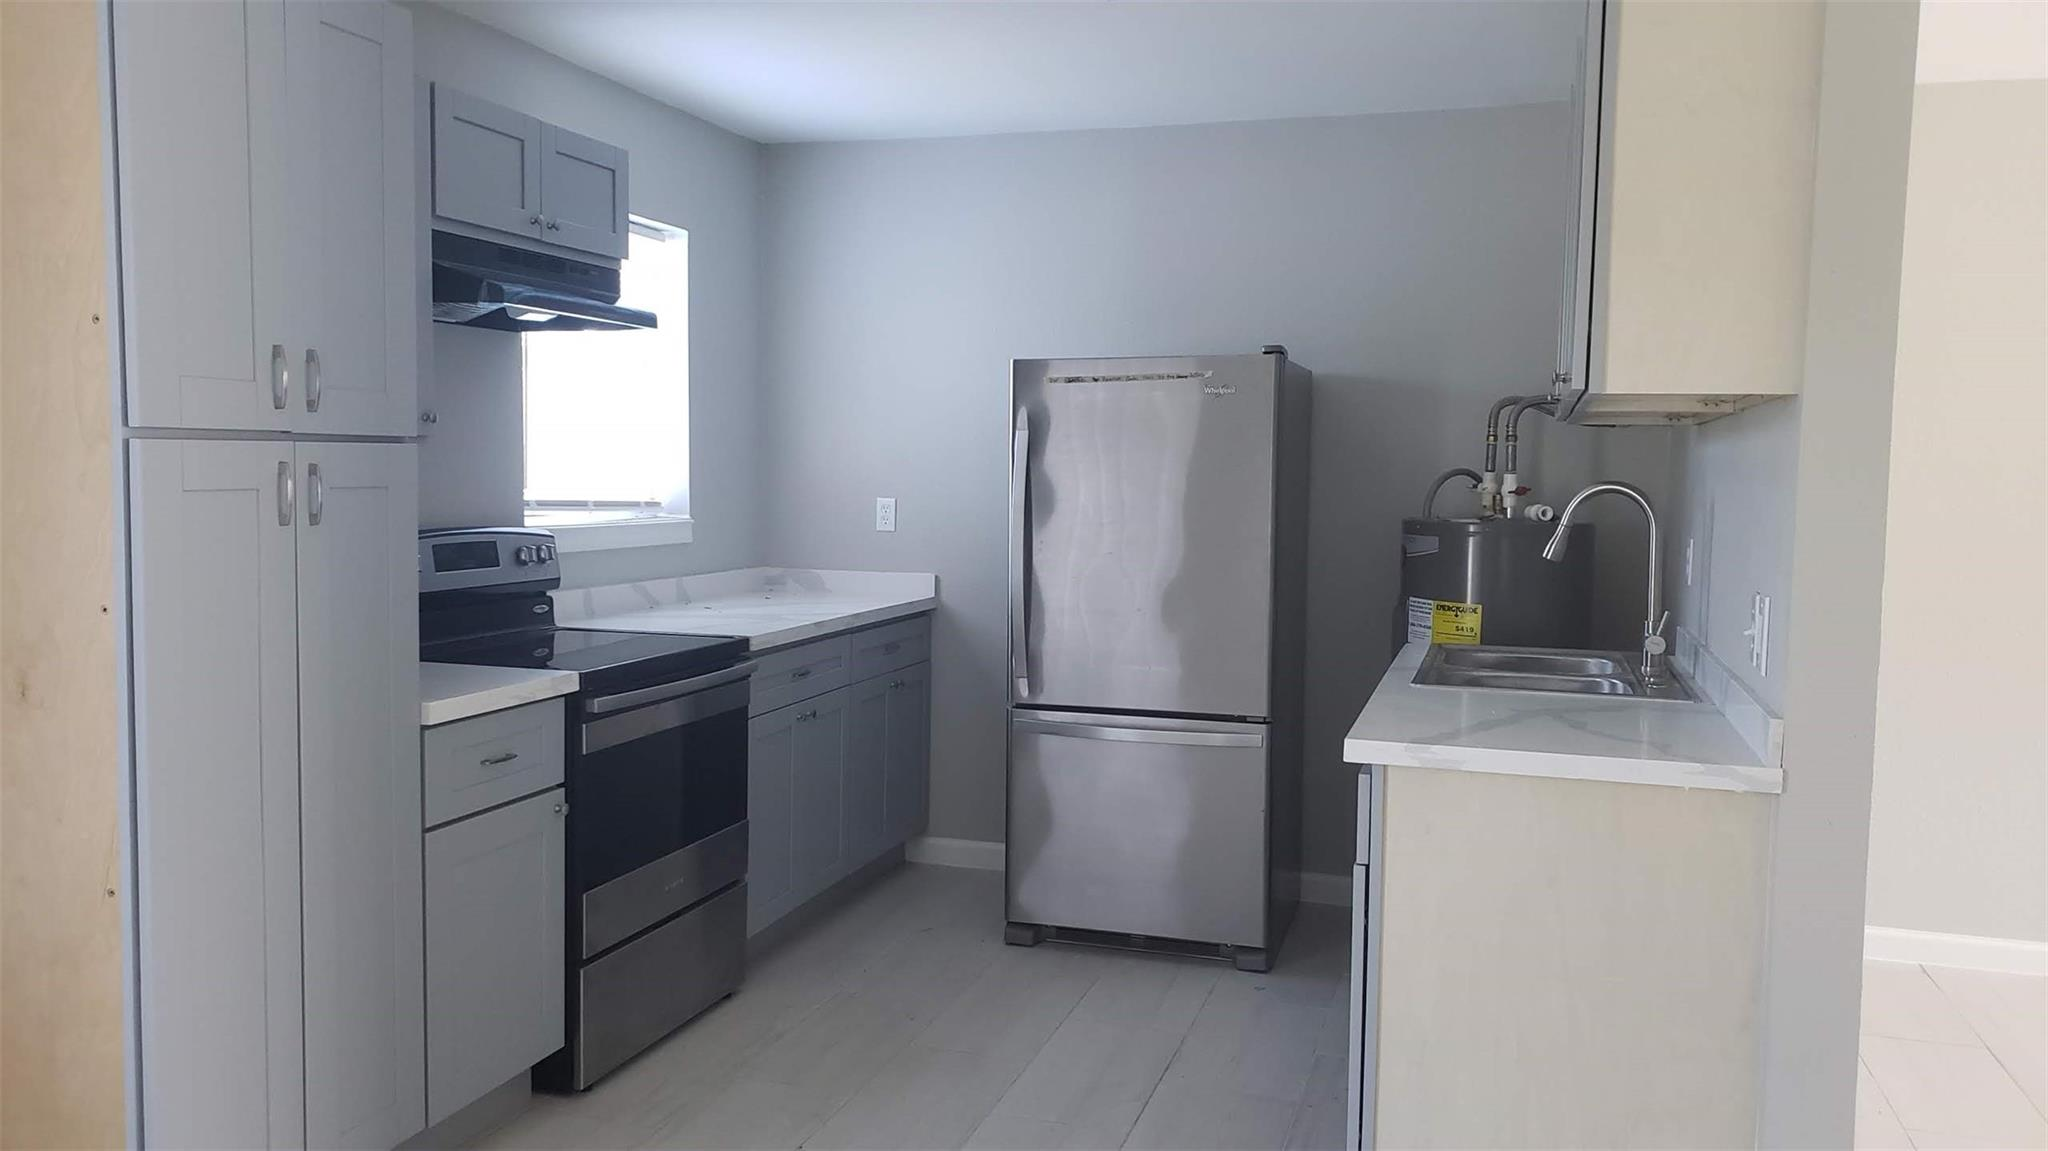 235 Hamlink Road #1 Property Photo - Beasley, TX real estate listing